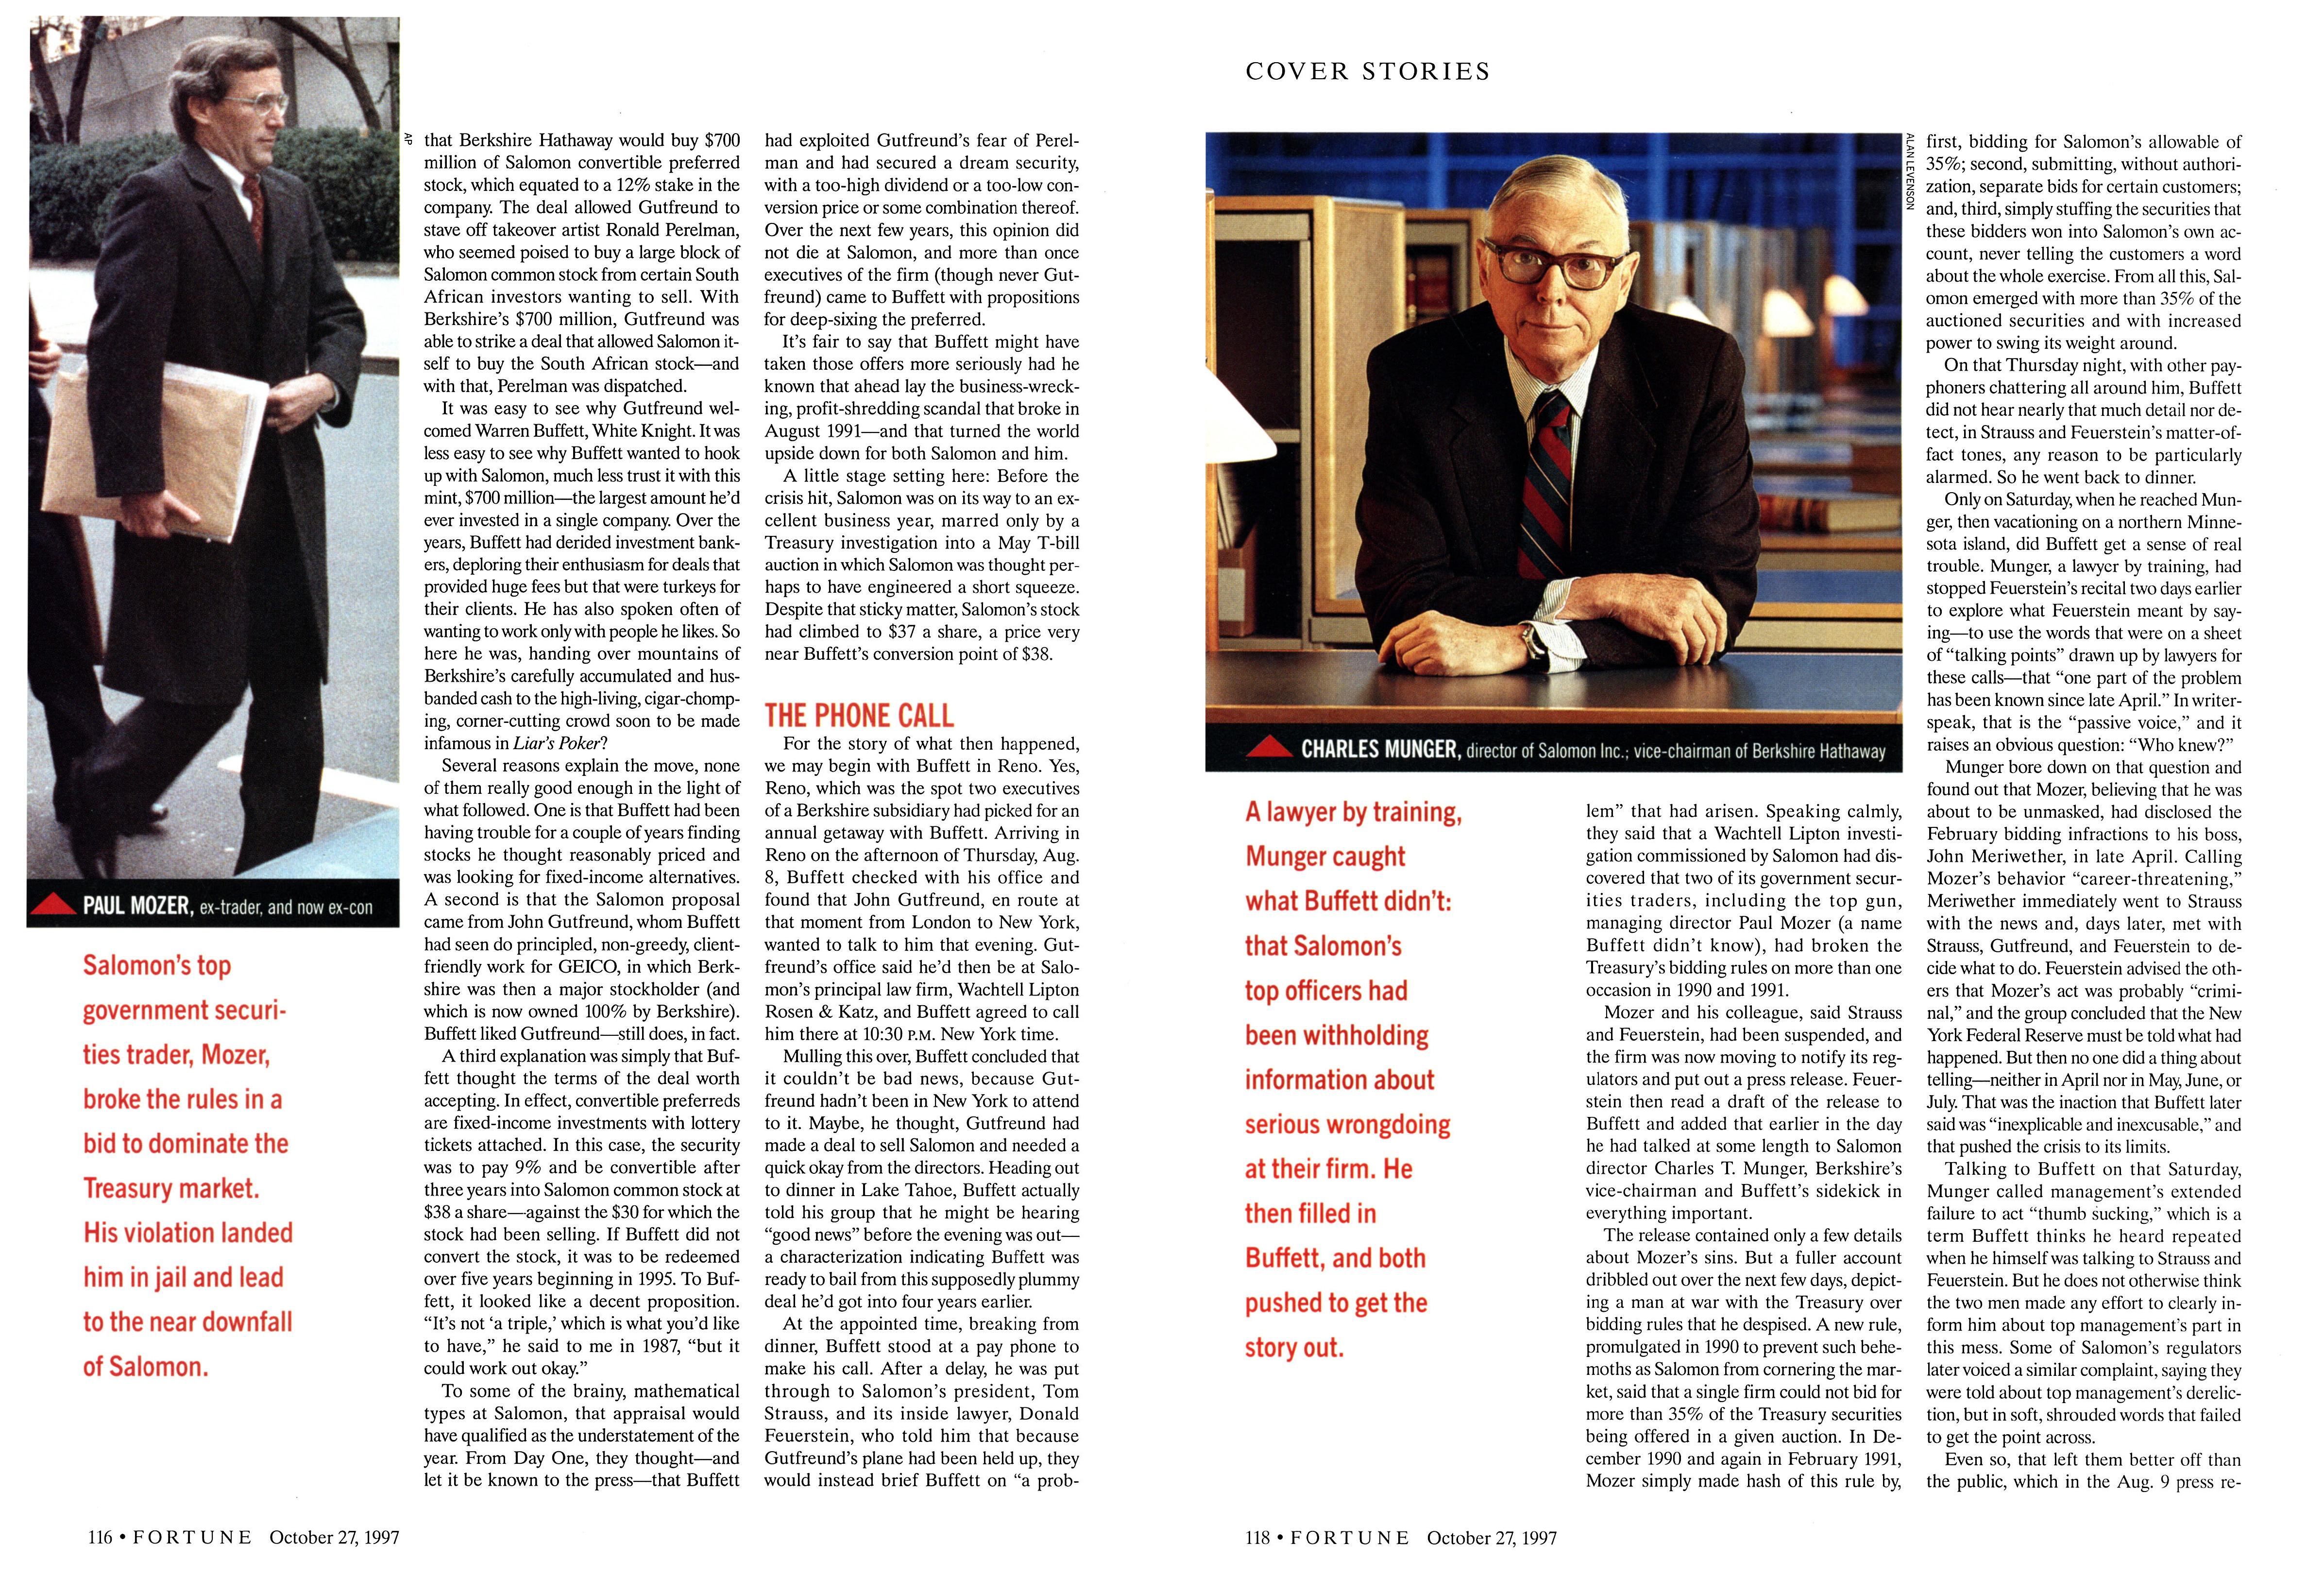 Warren Buffett's Wild Ride at Salomon   Fortune